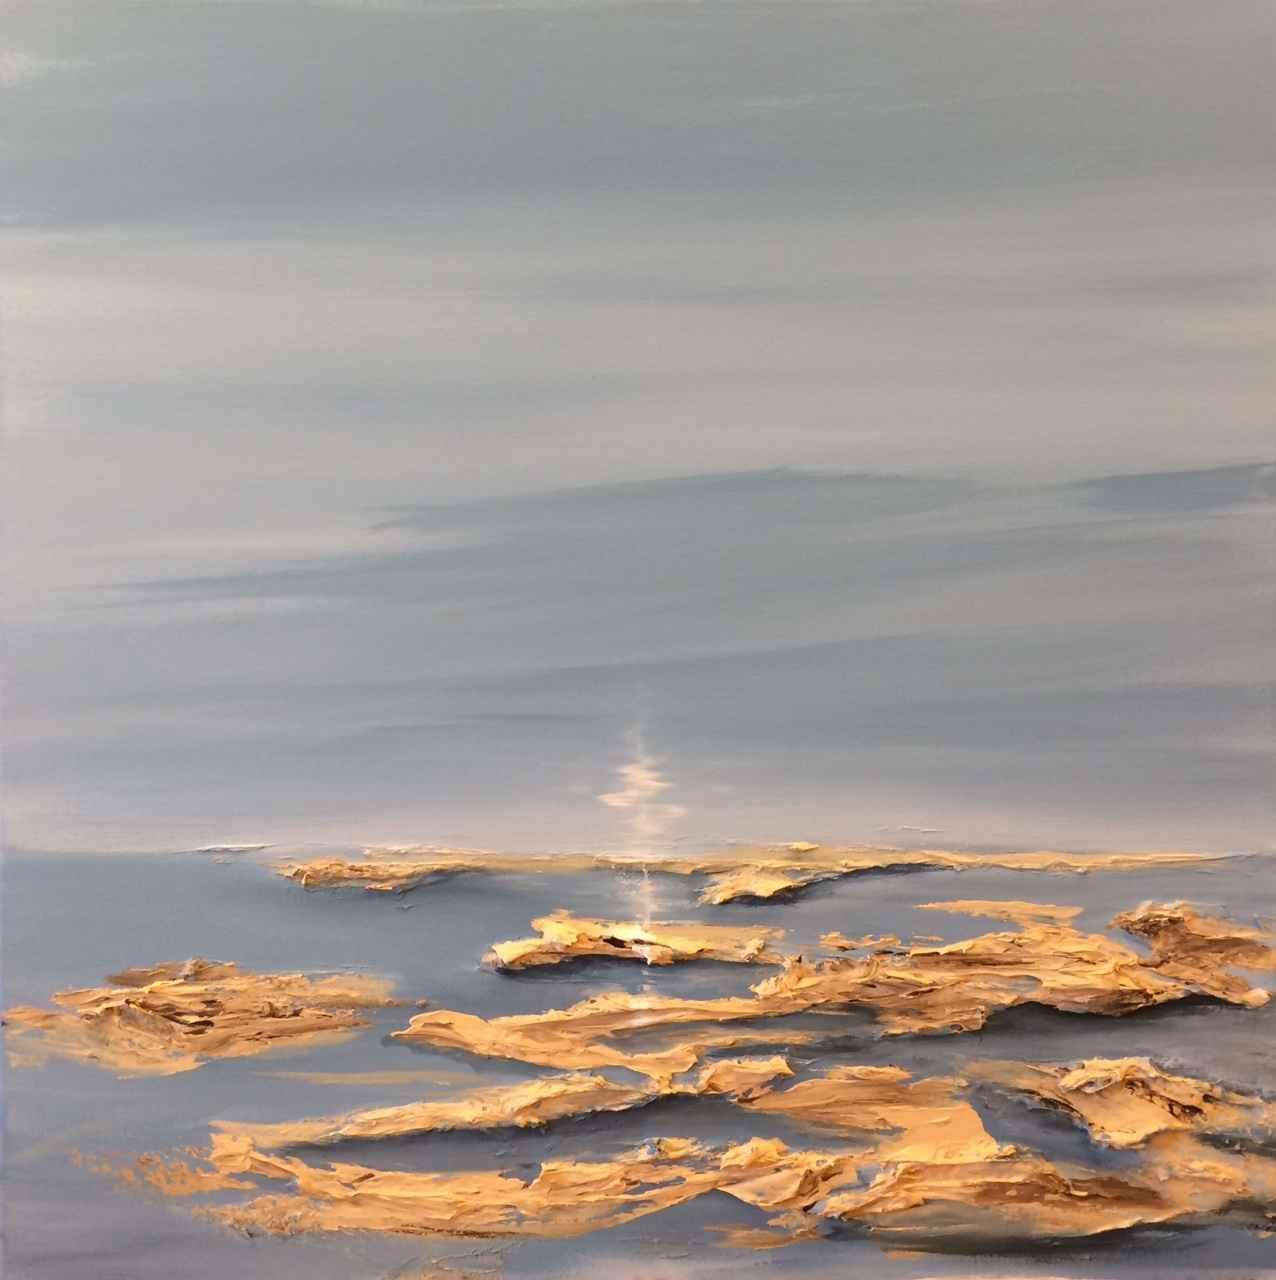 Seaside Melody #2 by  Steve Lyons - Masterpiece Online